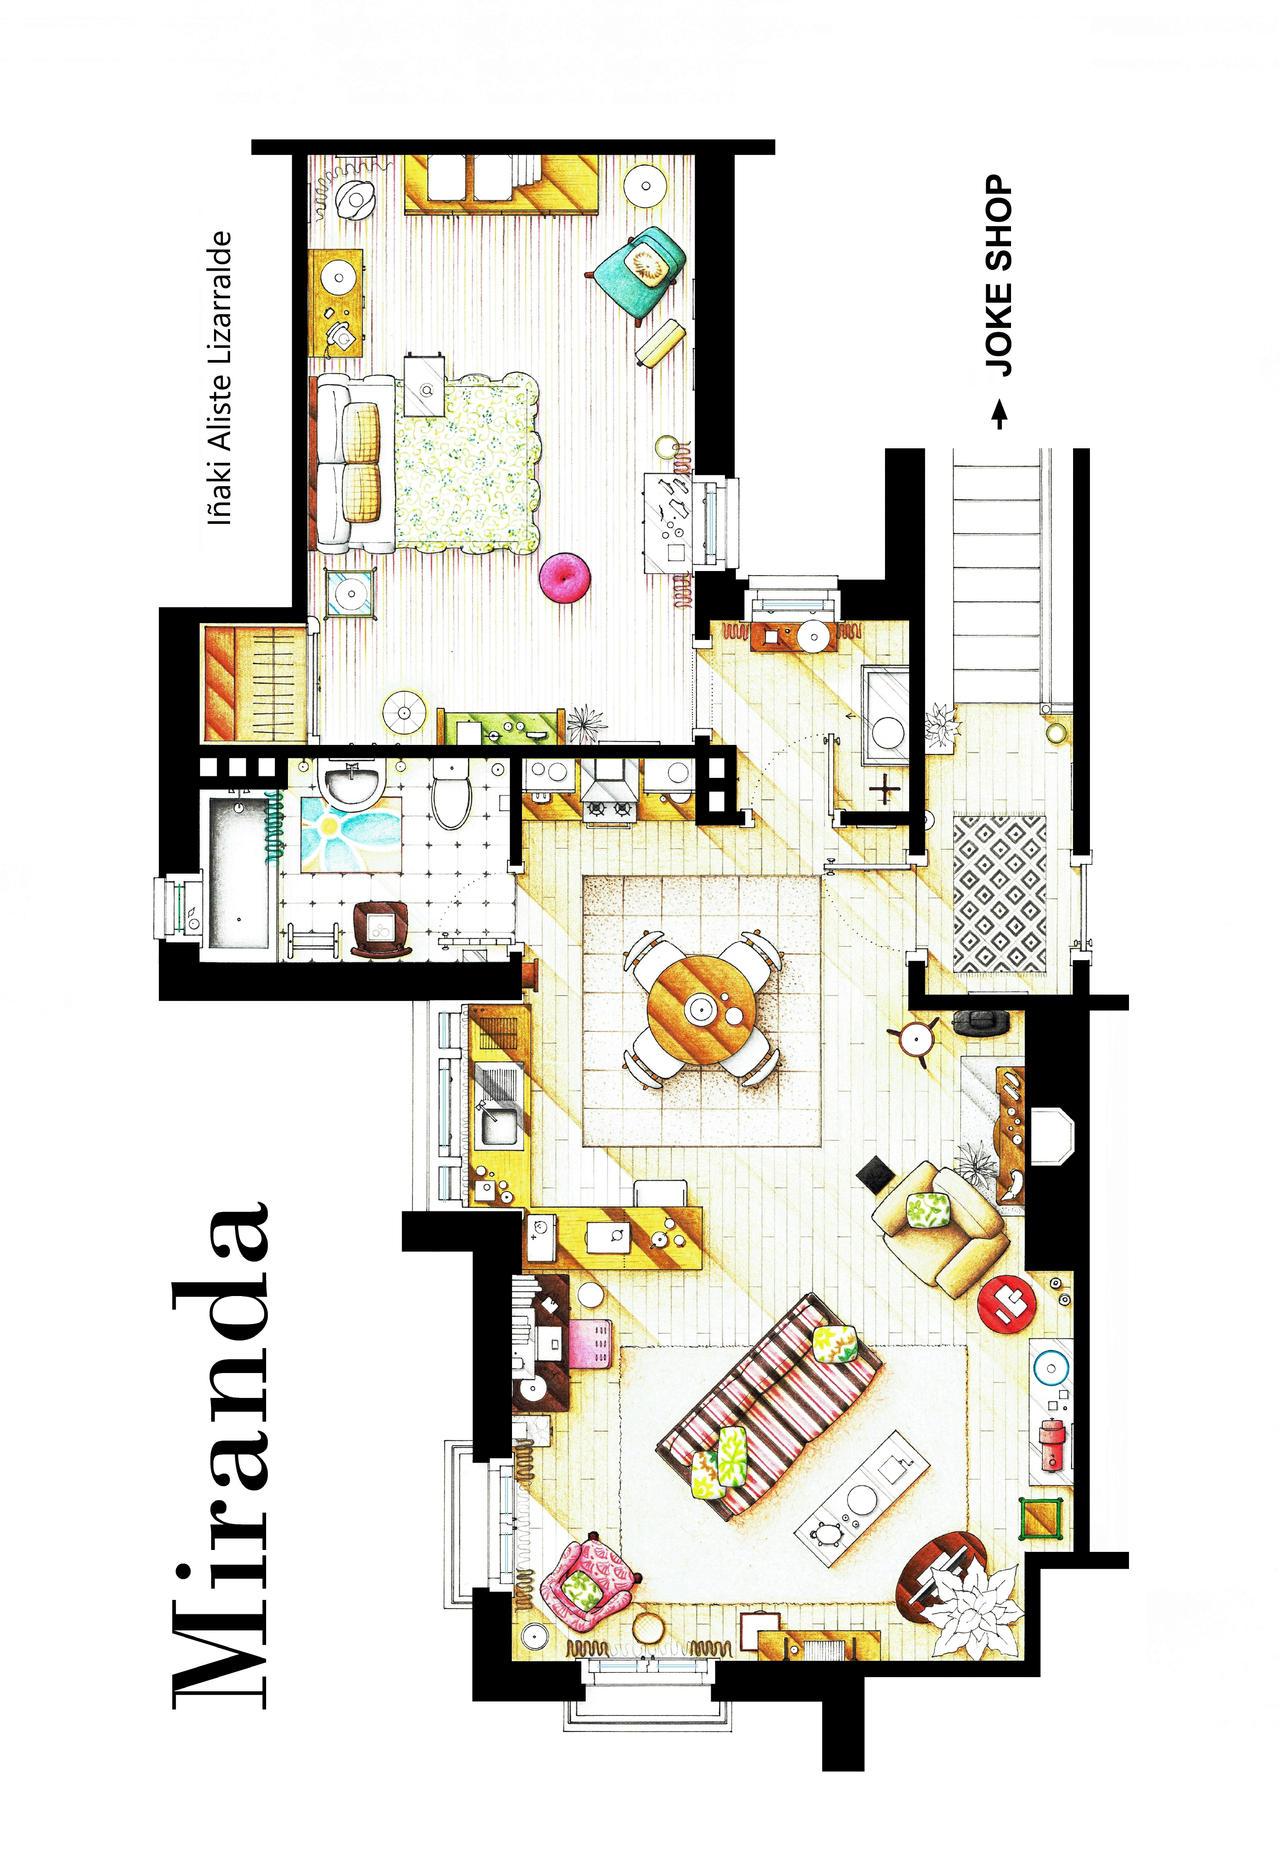 Floorplan of MIRANDA's Apartment by nikneuk